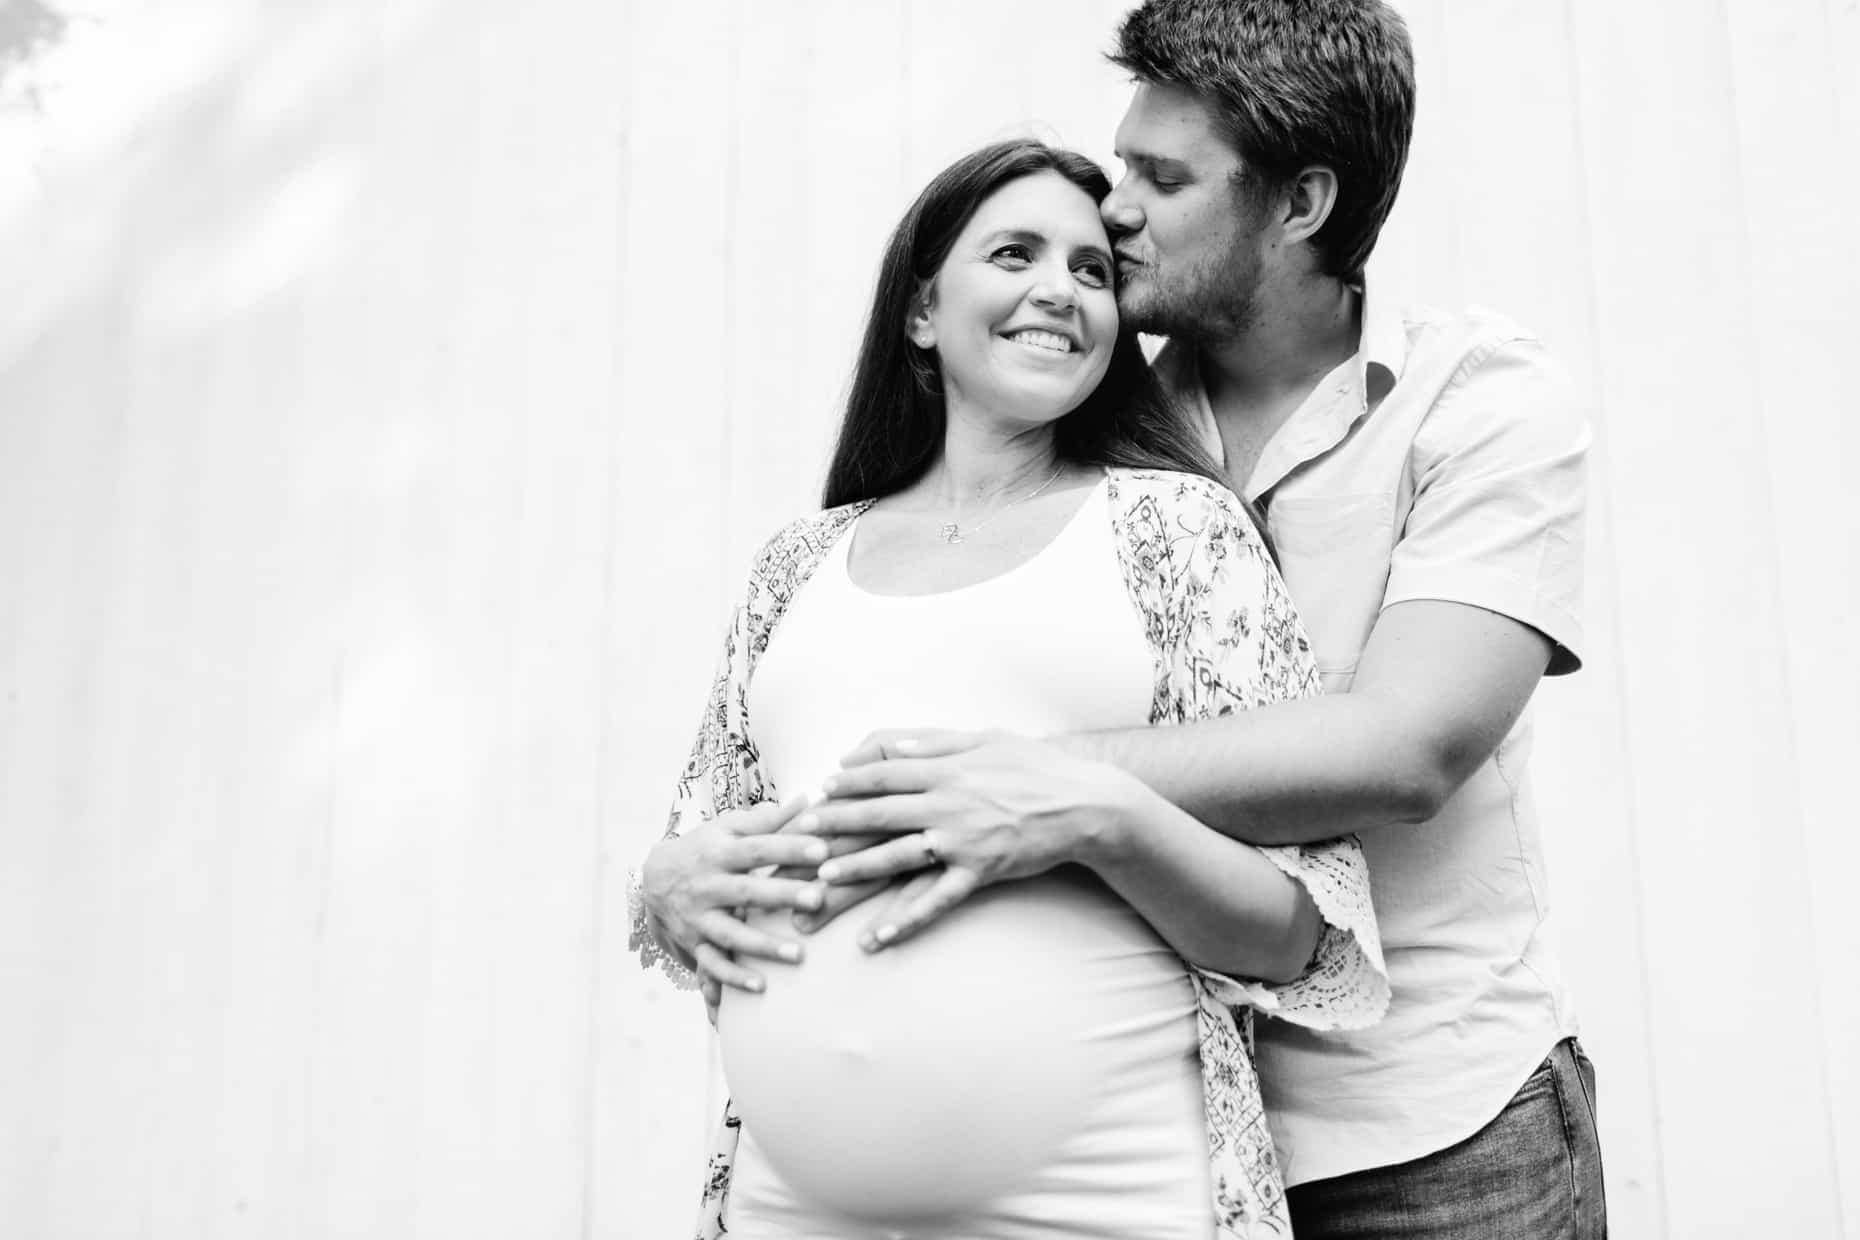 Bucks County Maternity Photography